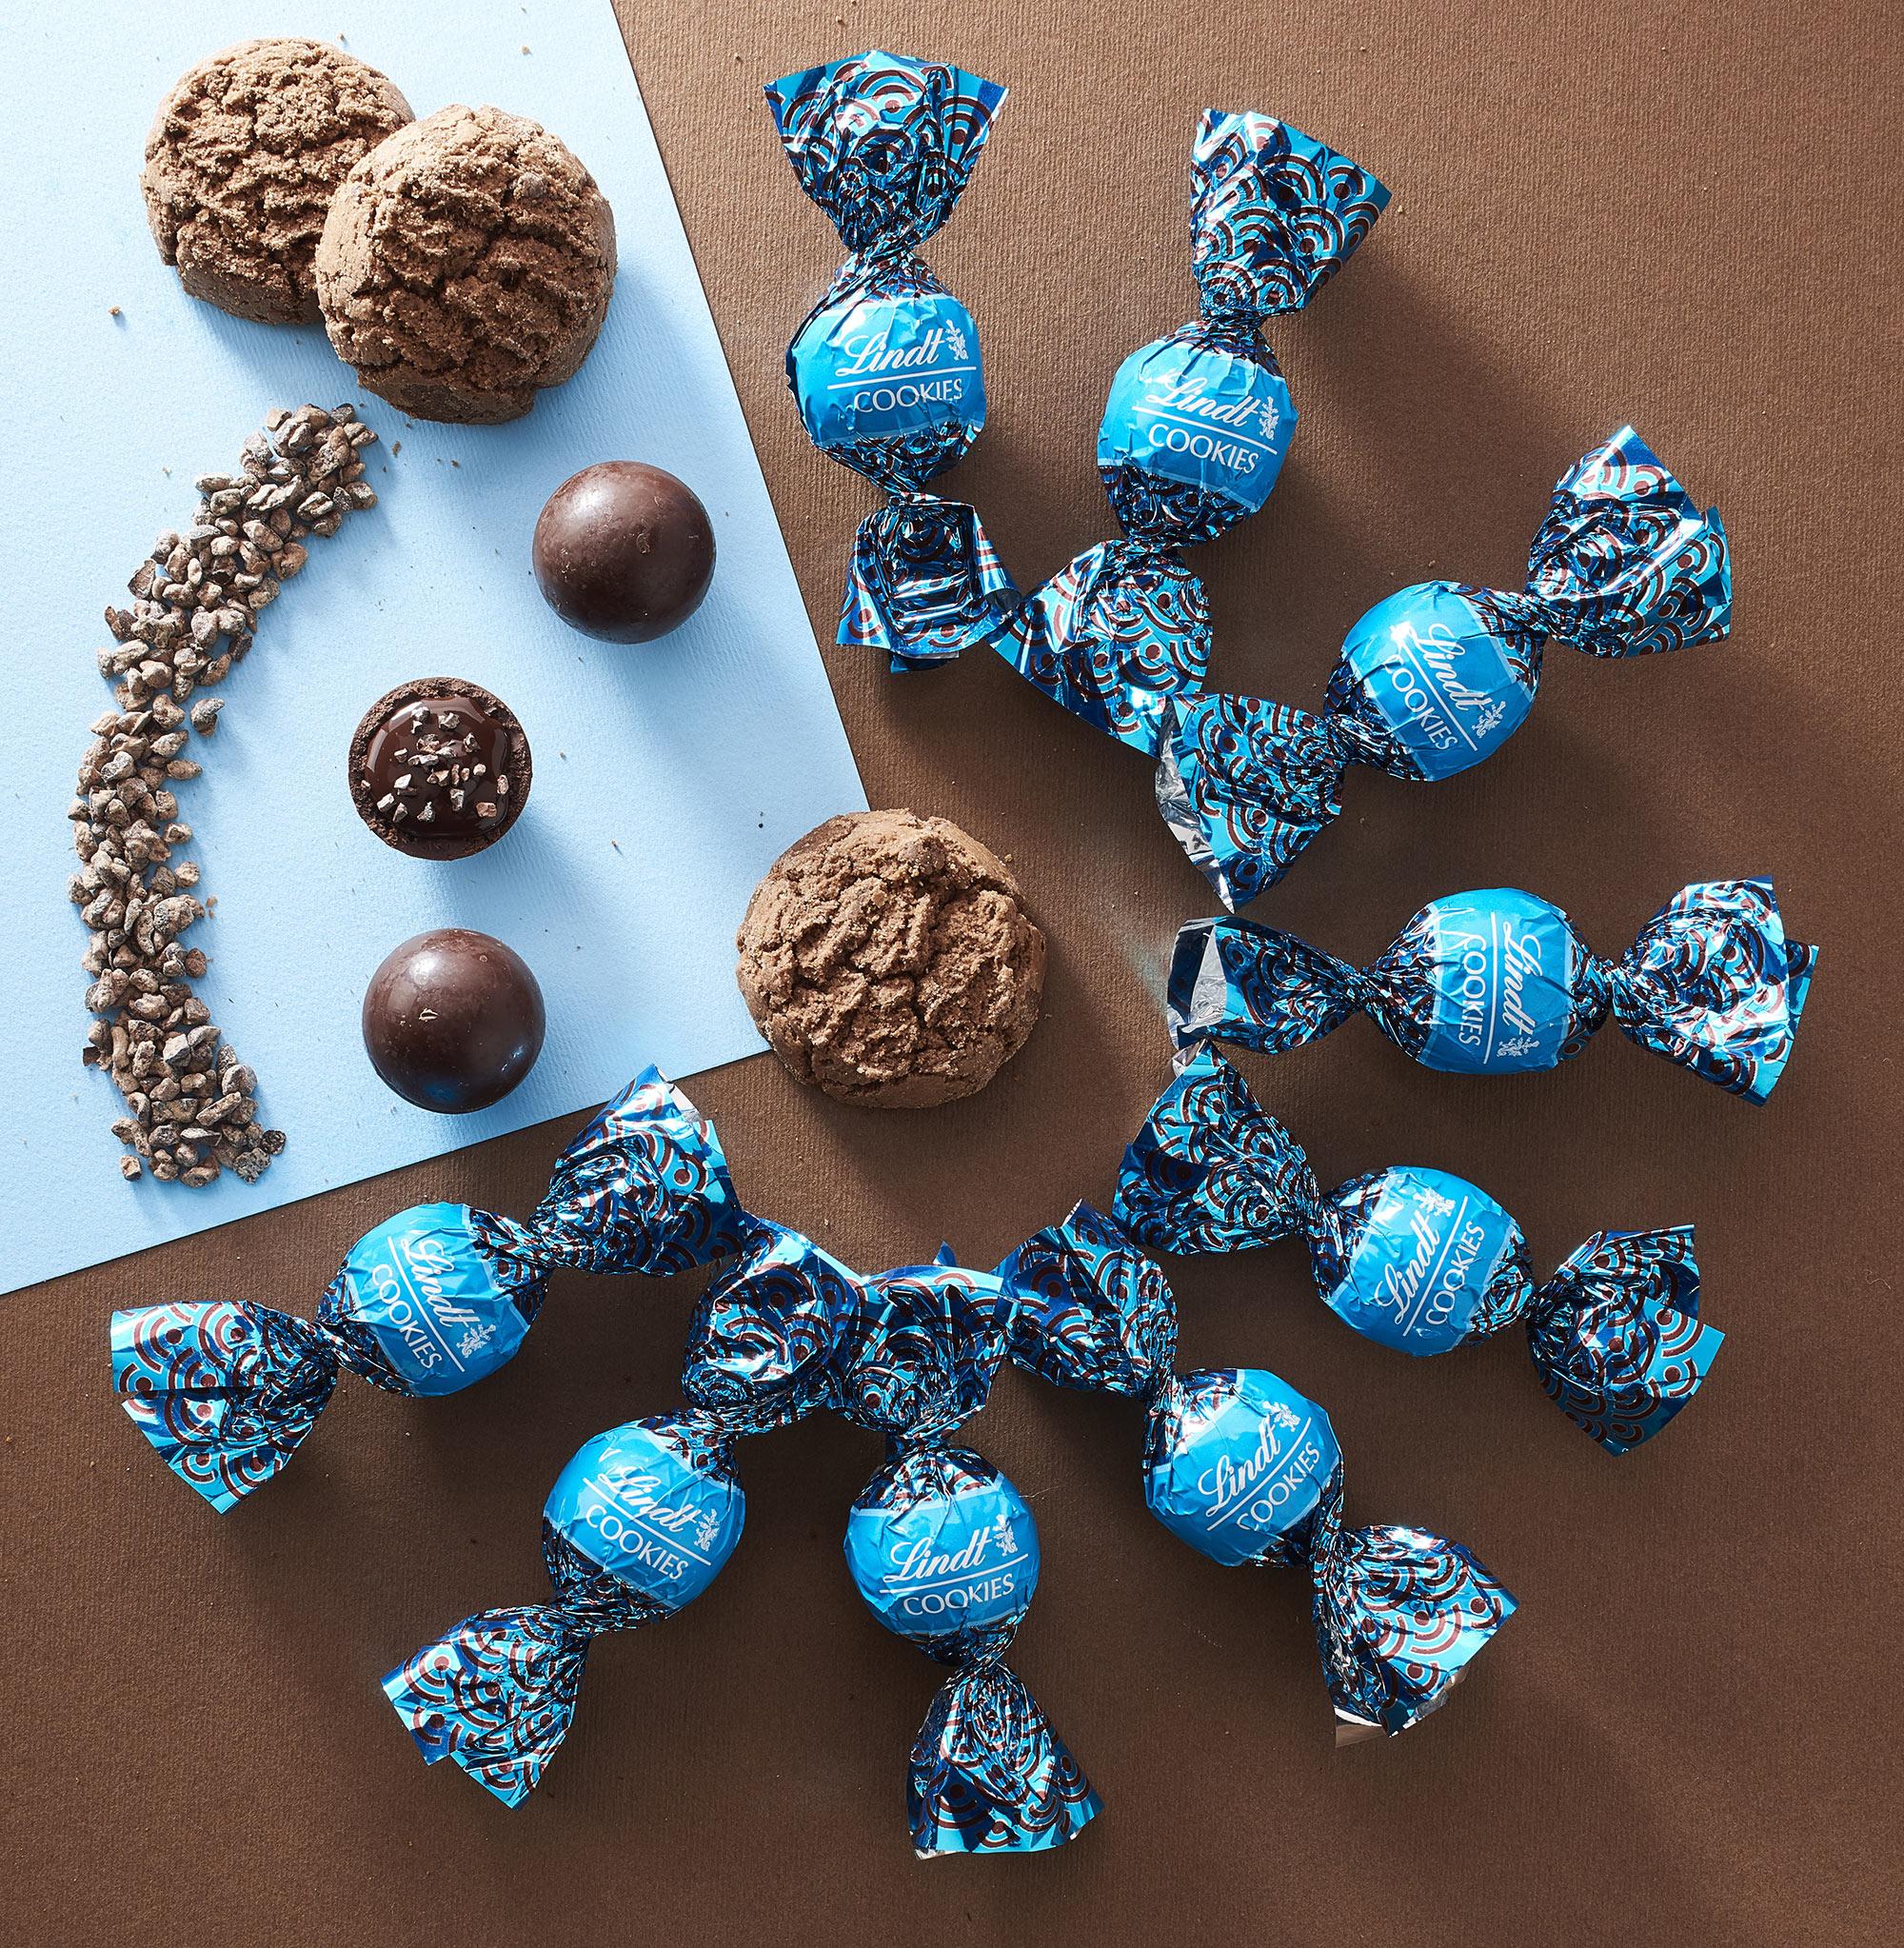 Lindt Cioccolato Pralina Roulette Coockies Food Shot by Fotografando